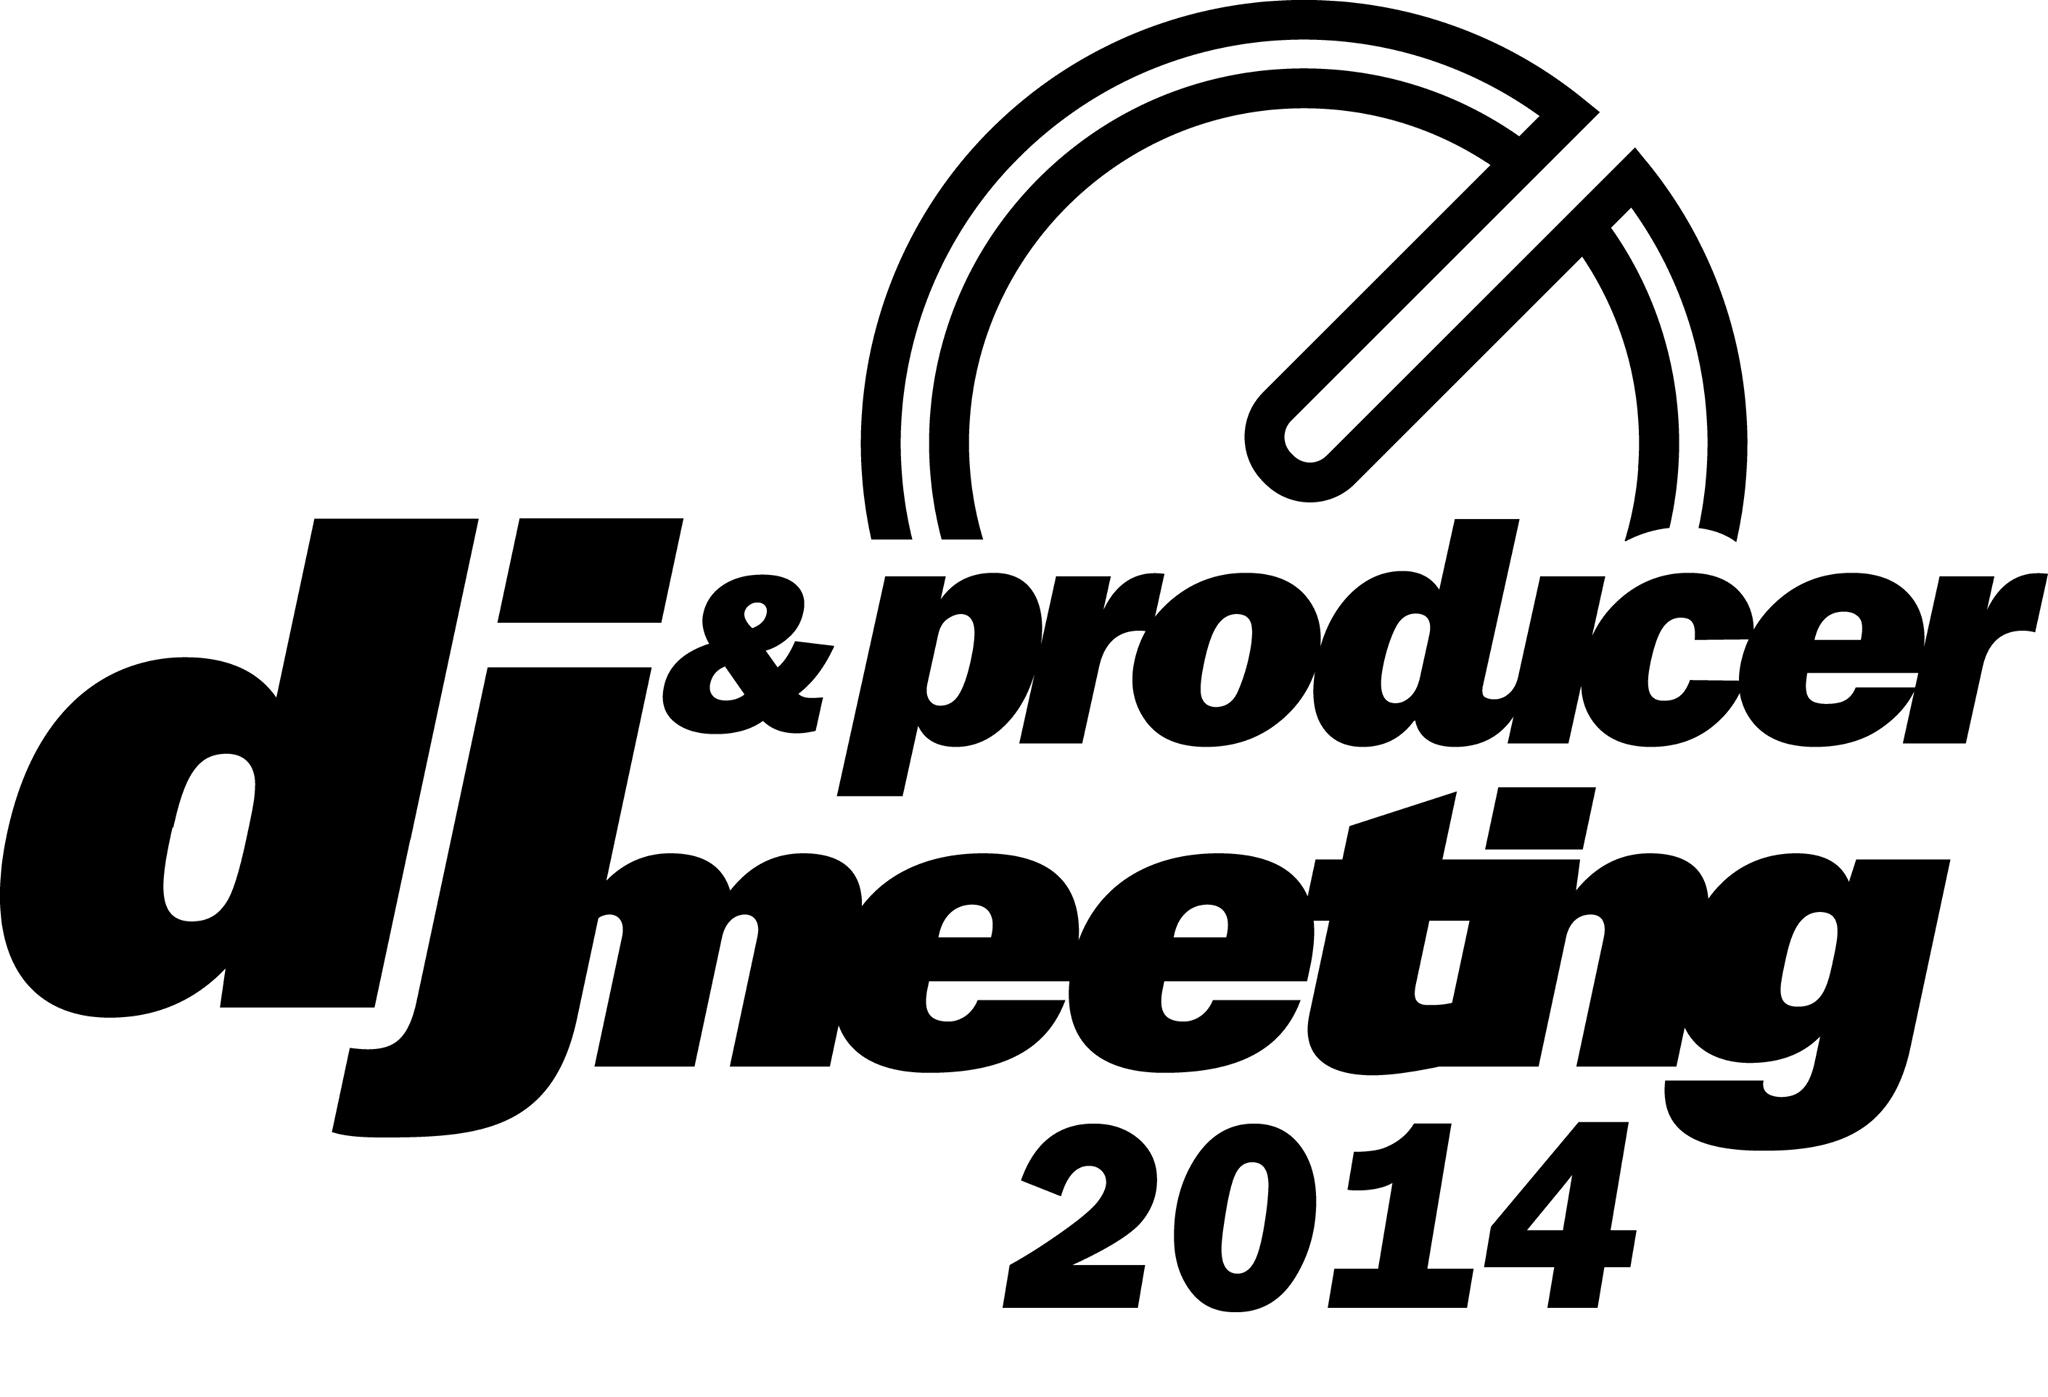 DJ & Producer Meeting 2014 abgesagt!